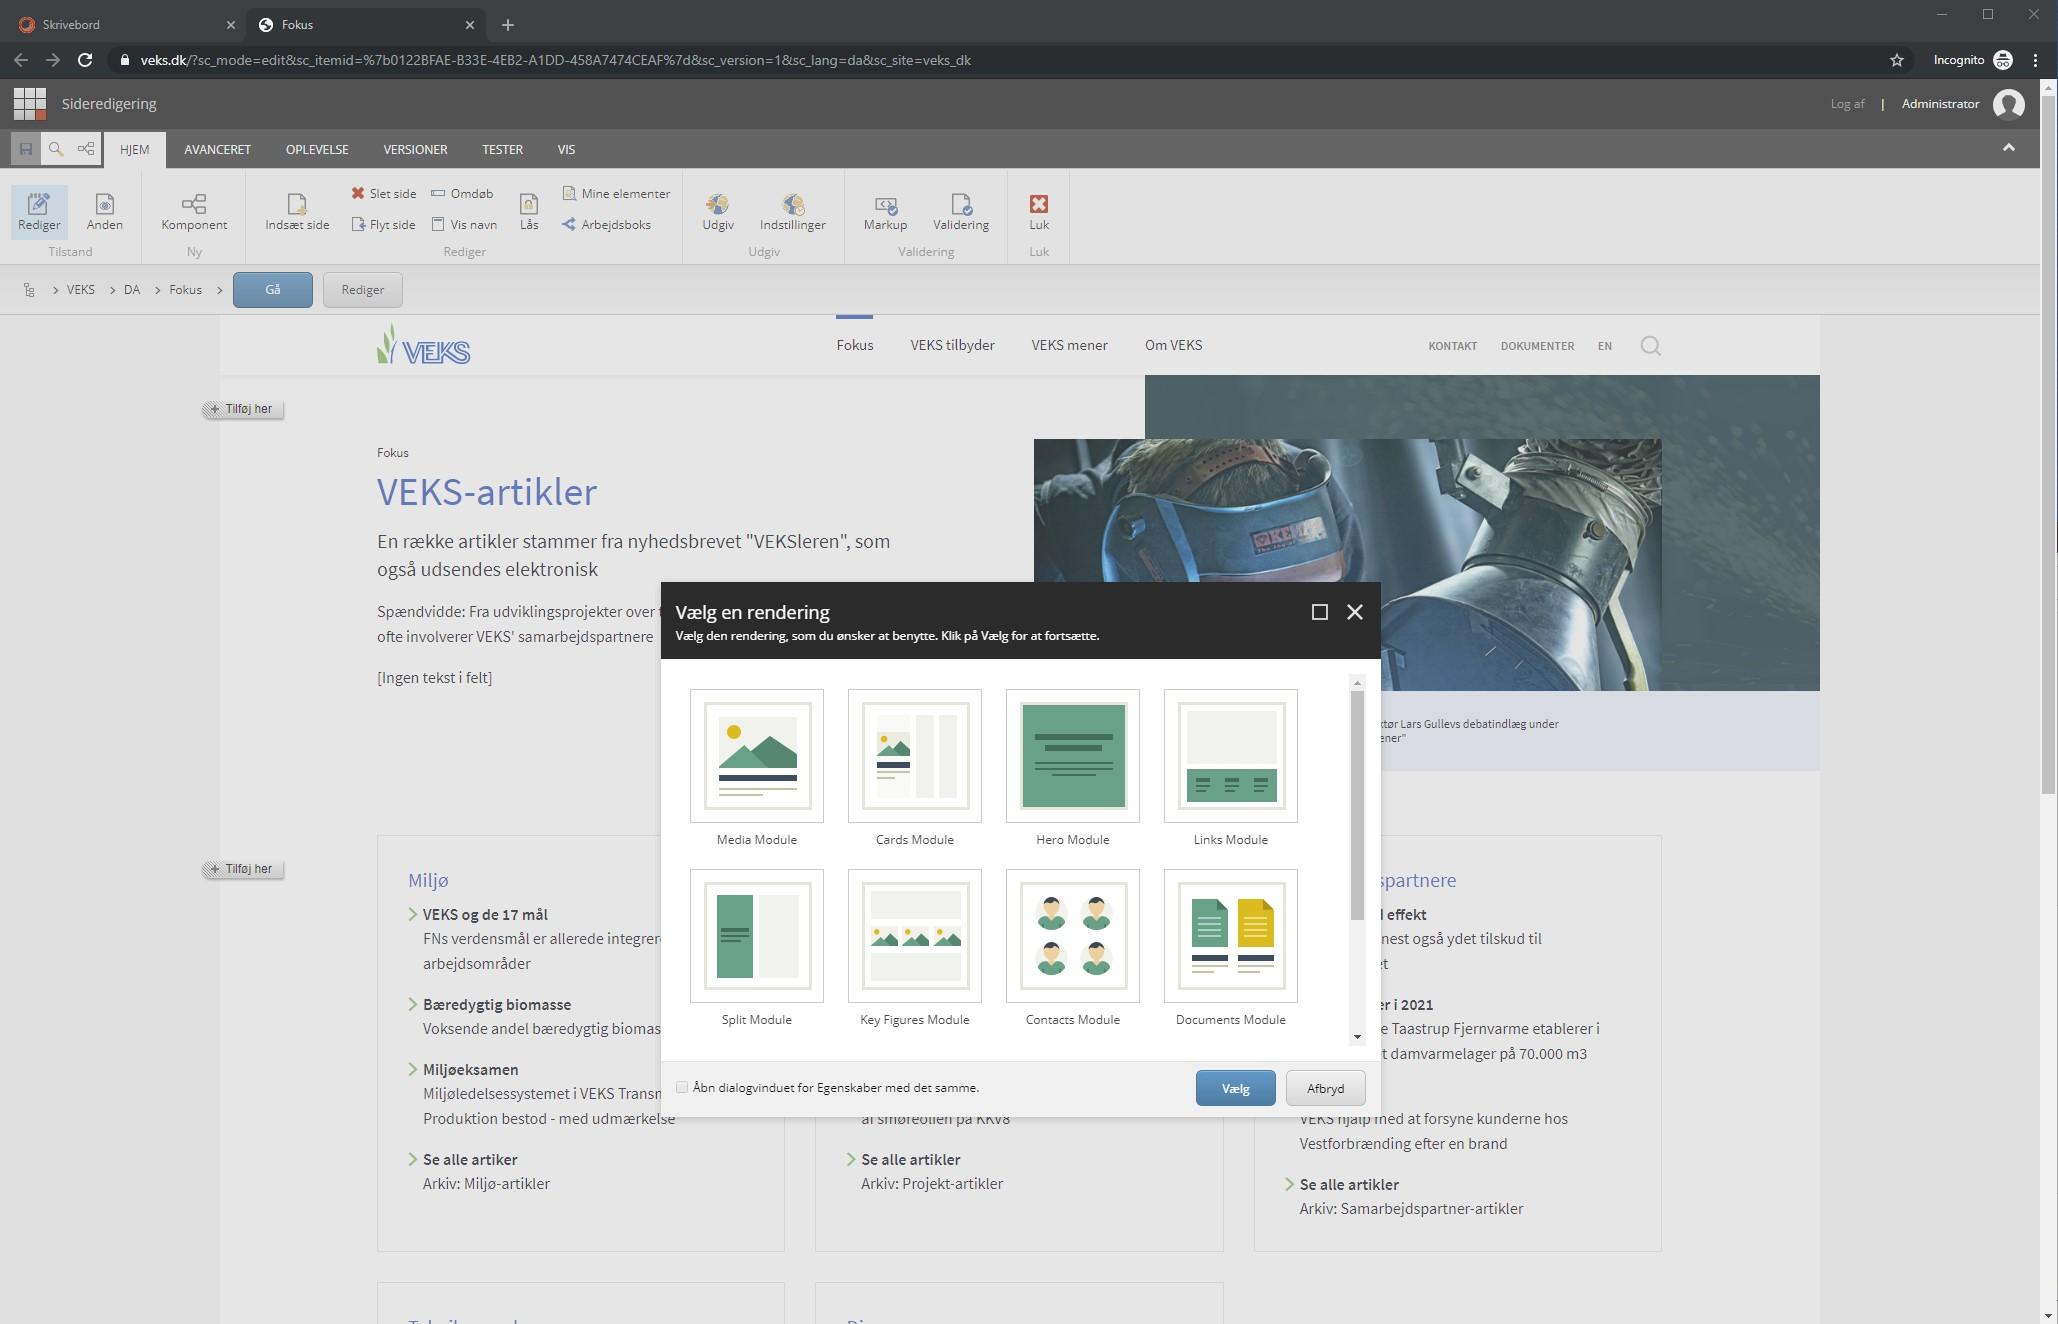 Sitecore Experience Editor